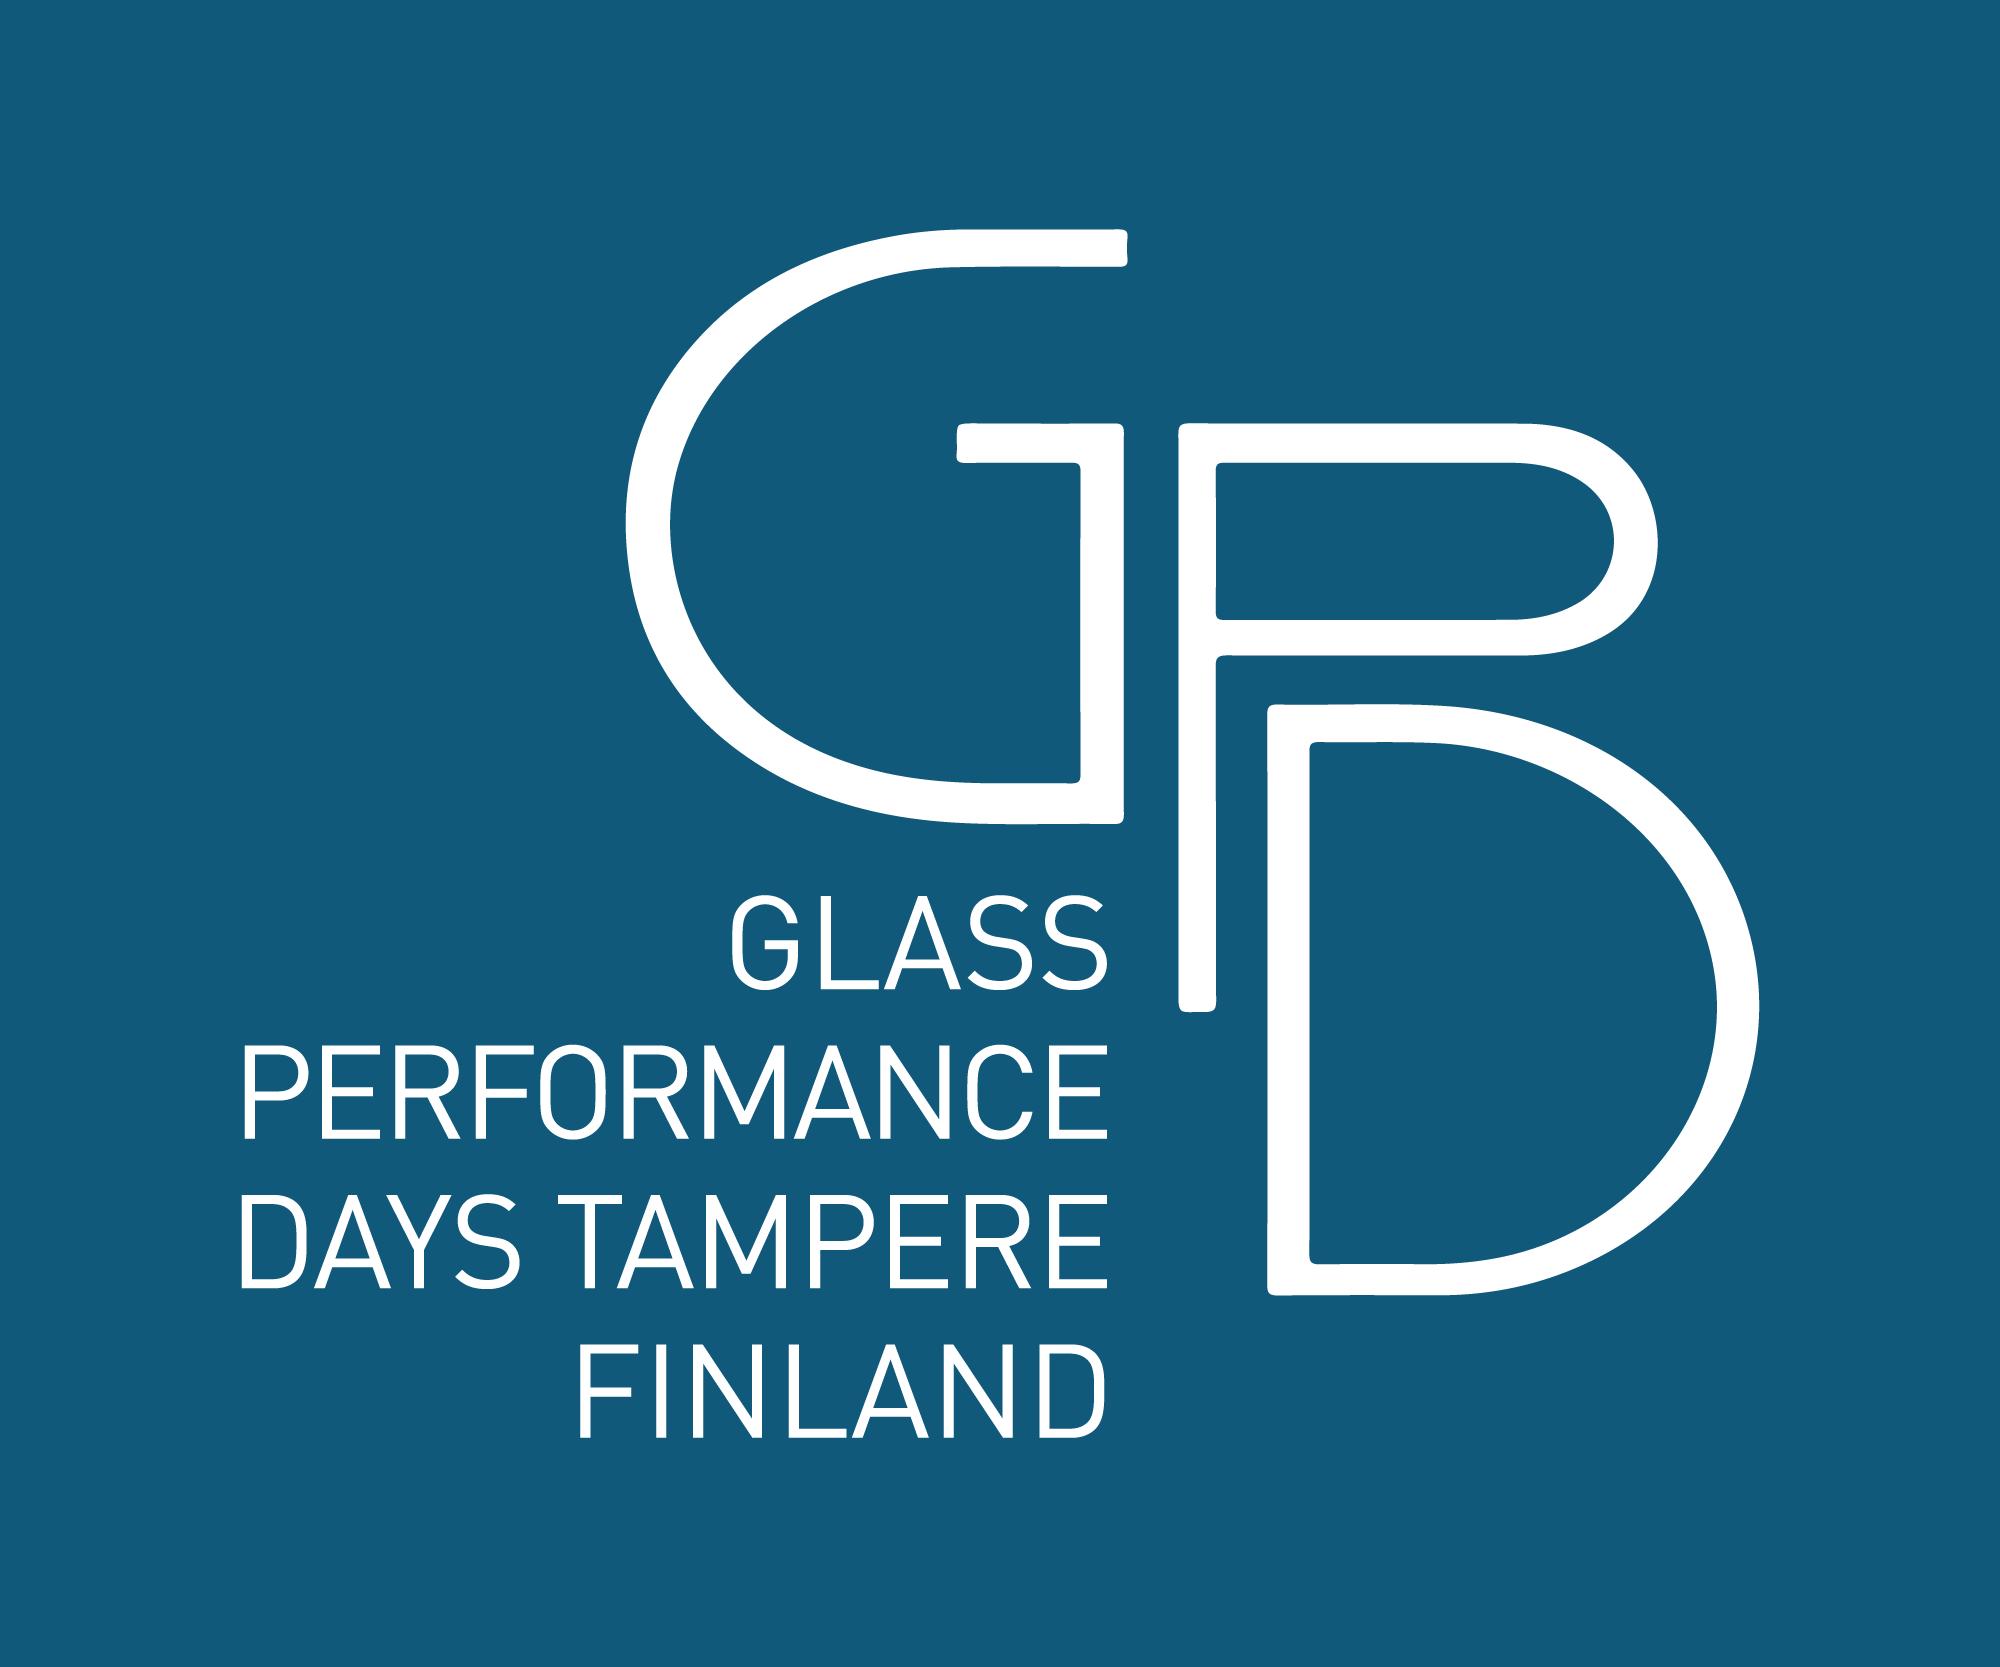 GPD_Finland